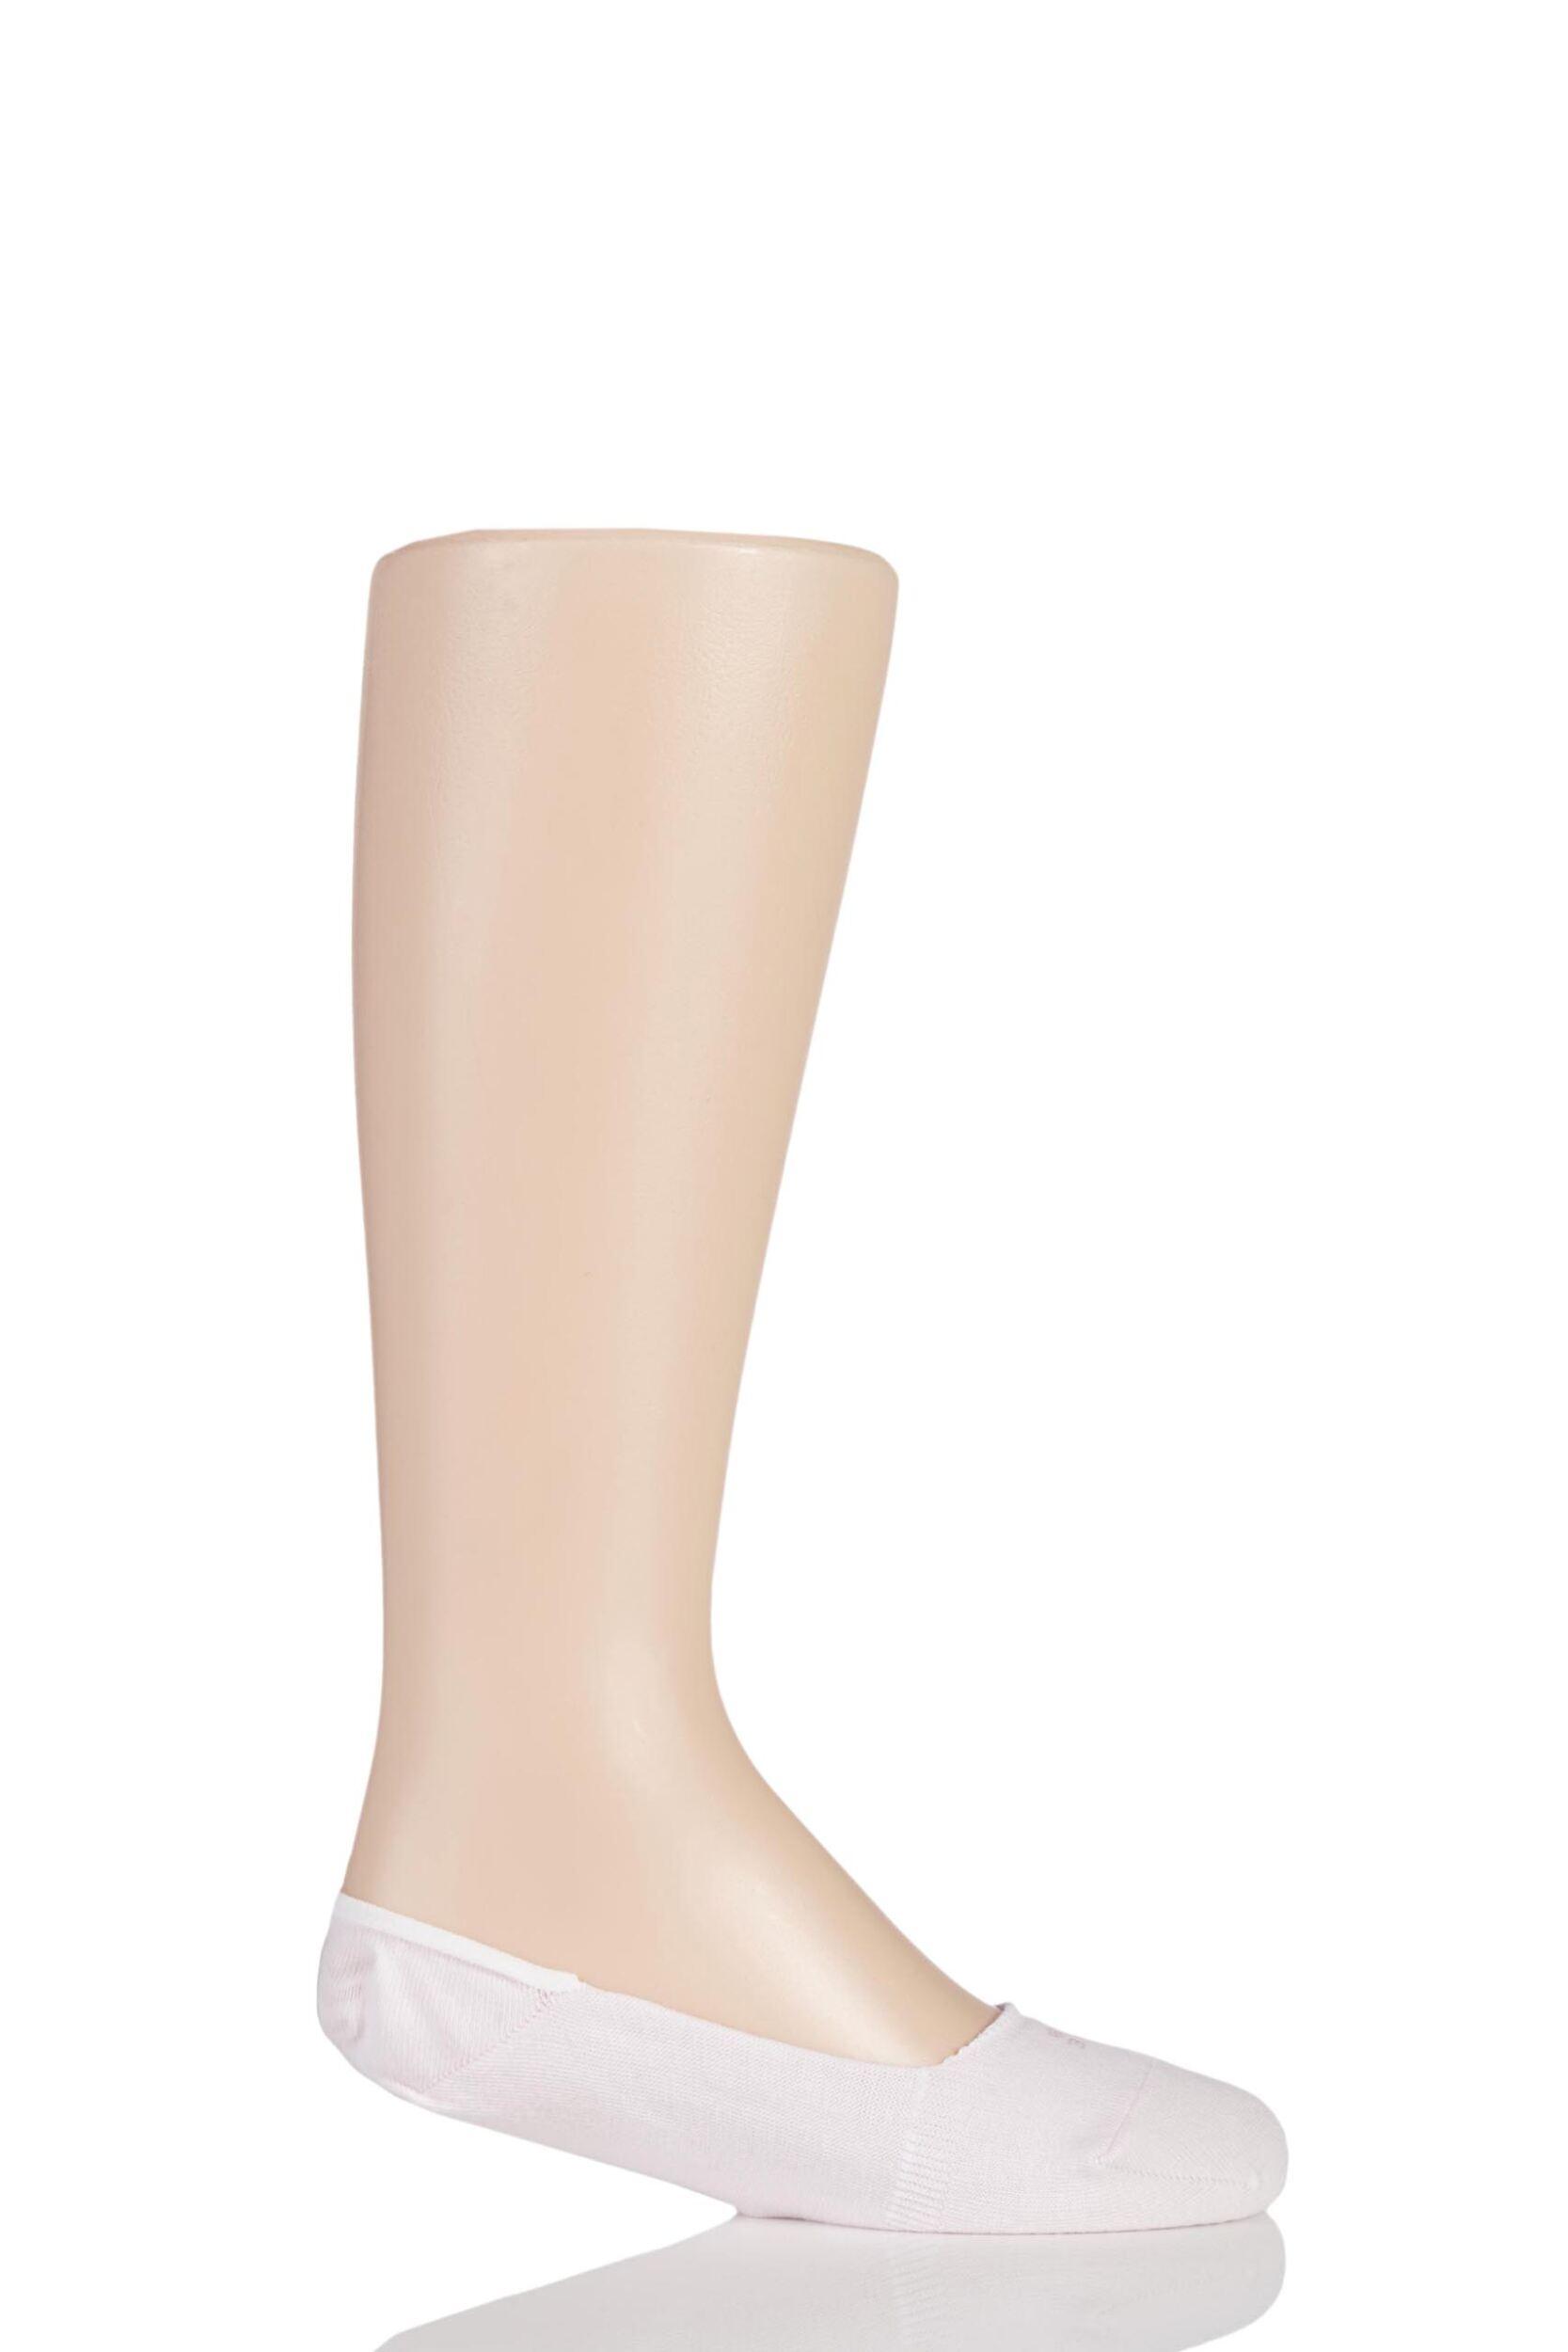 1 Pair Powder Rose Invisible Step Shoe Liners Kids Unisex 3-5 Teens (12-13 Years) - Falke